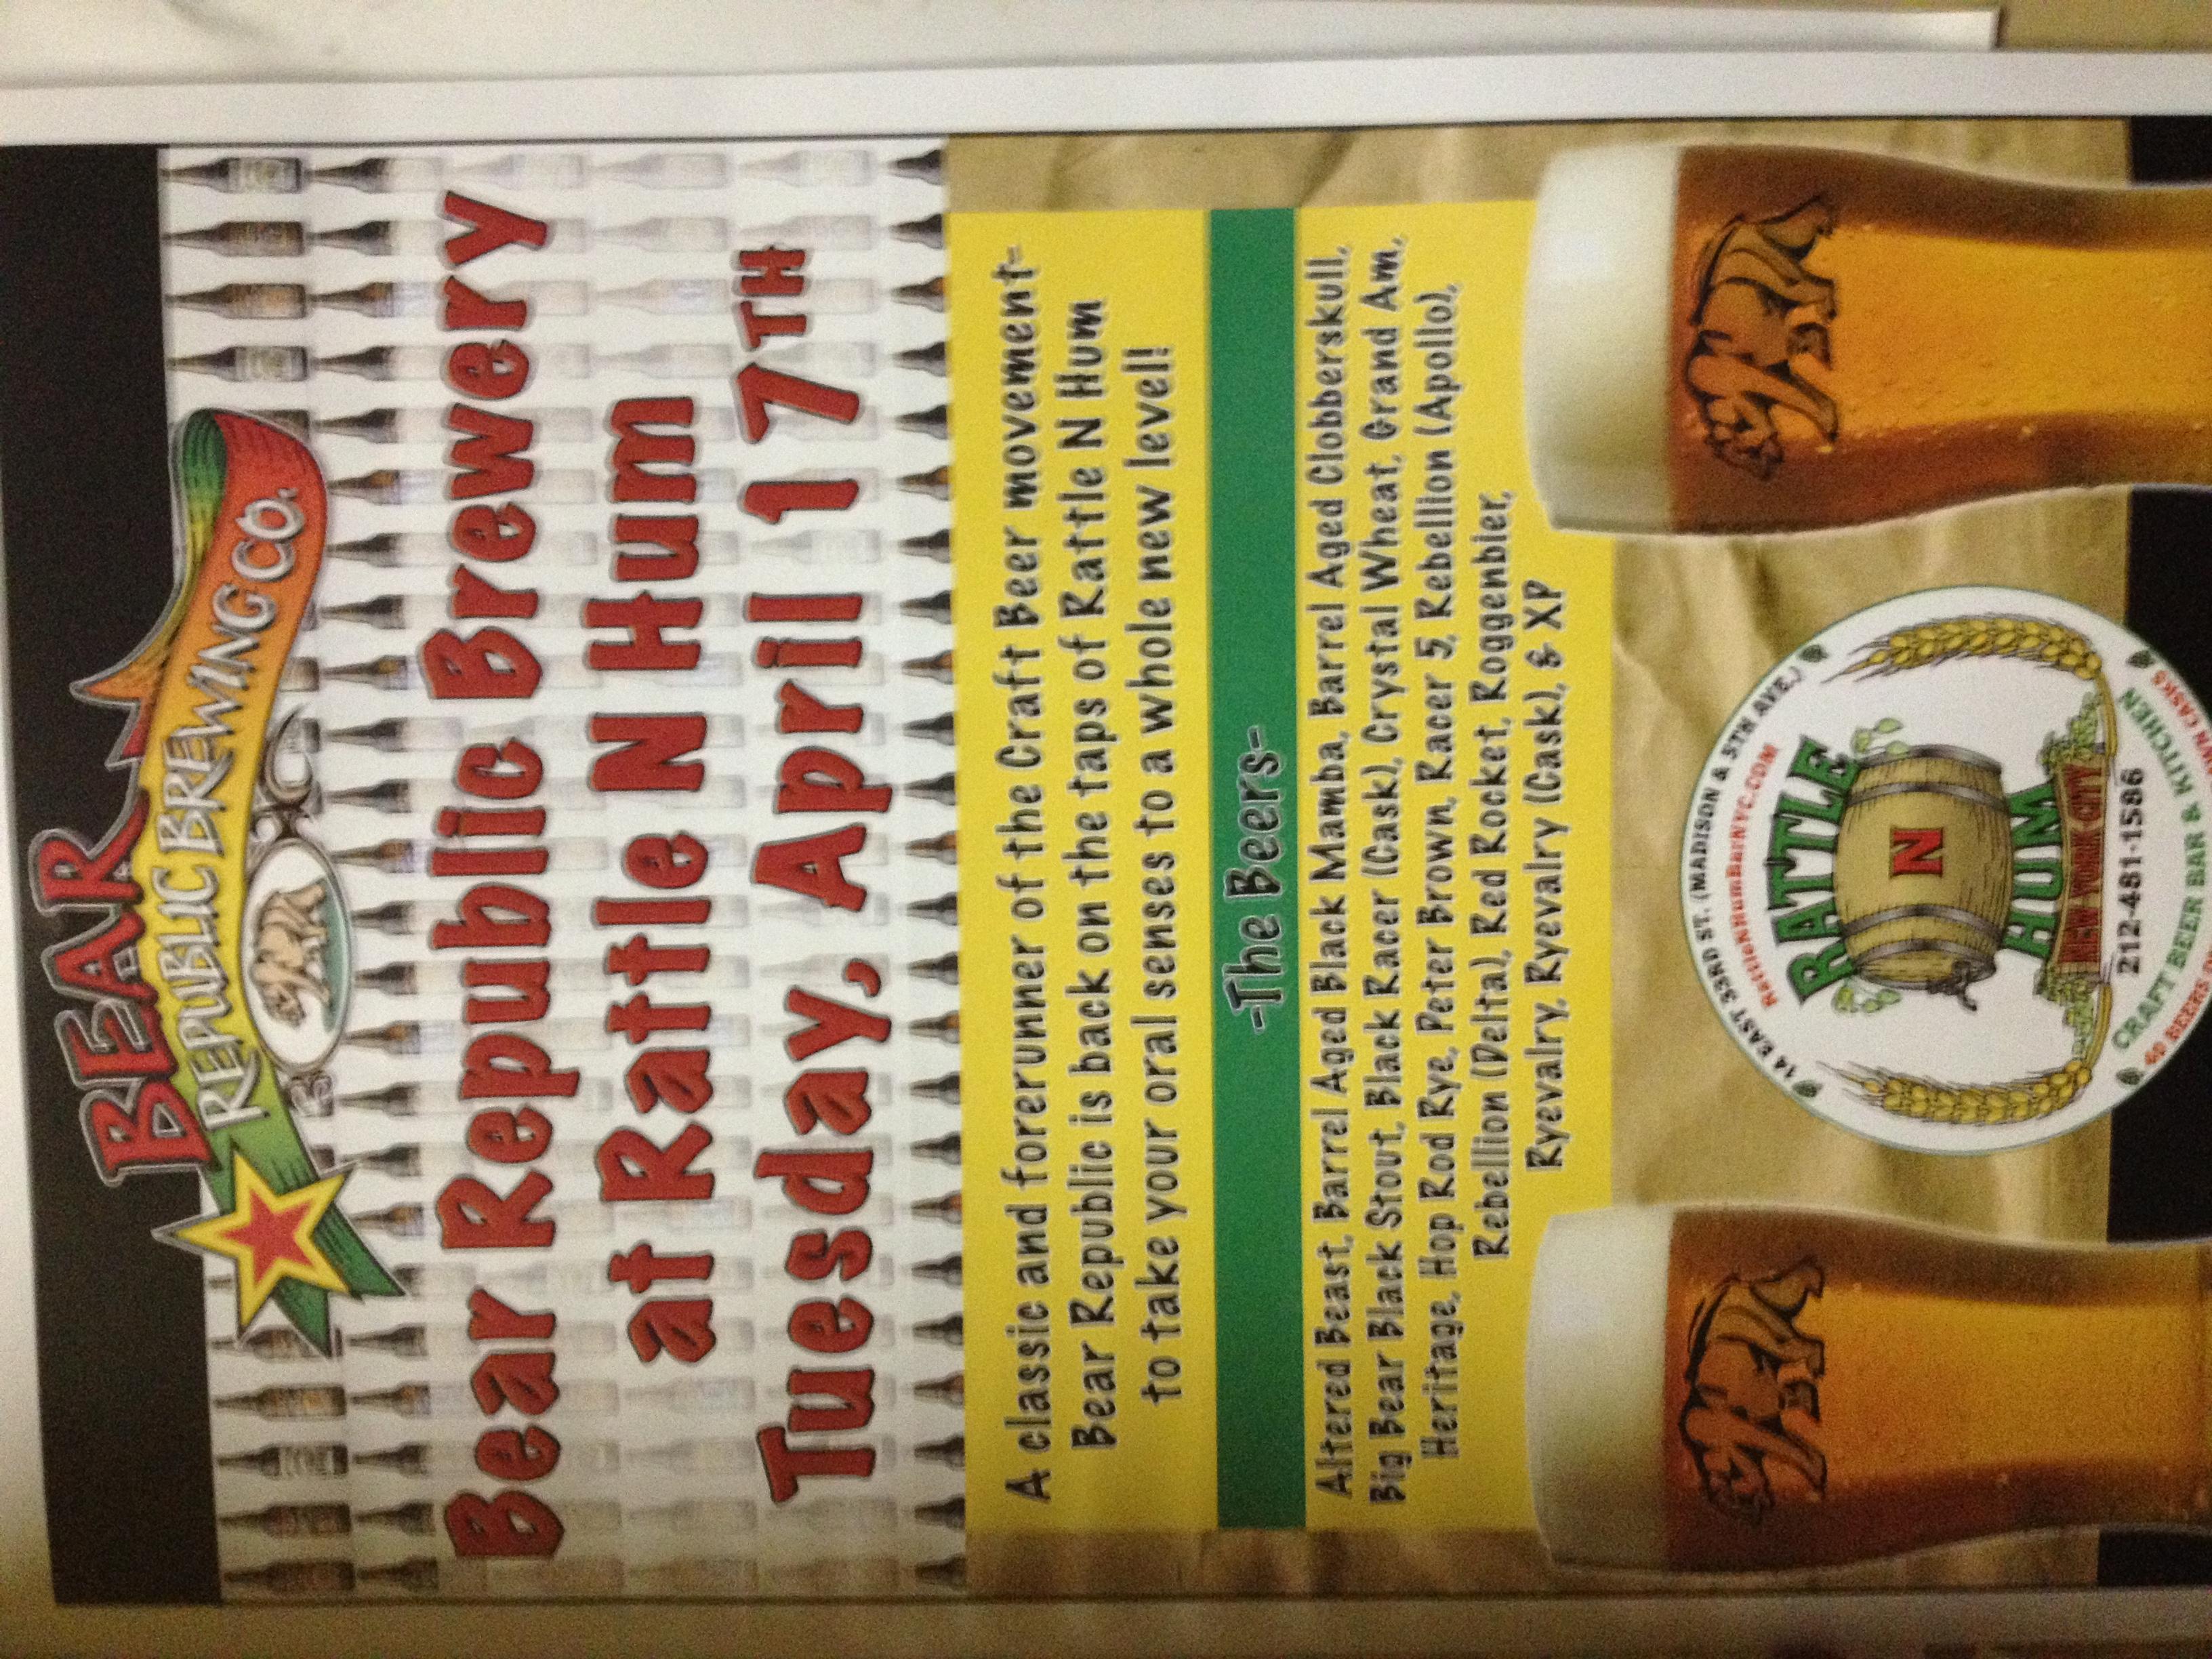 Rattle N Hum Bar Blog | Drink better beer, here!